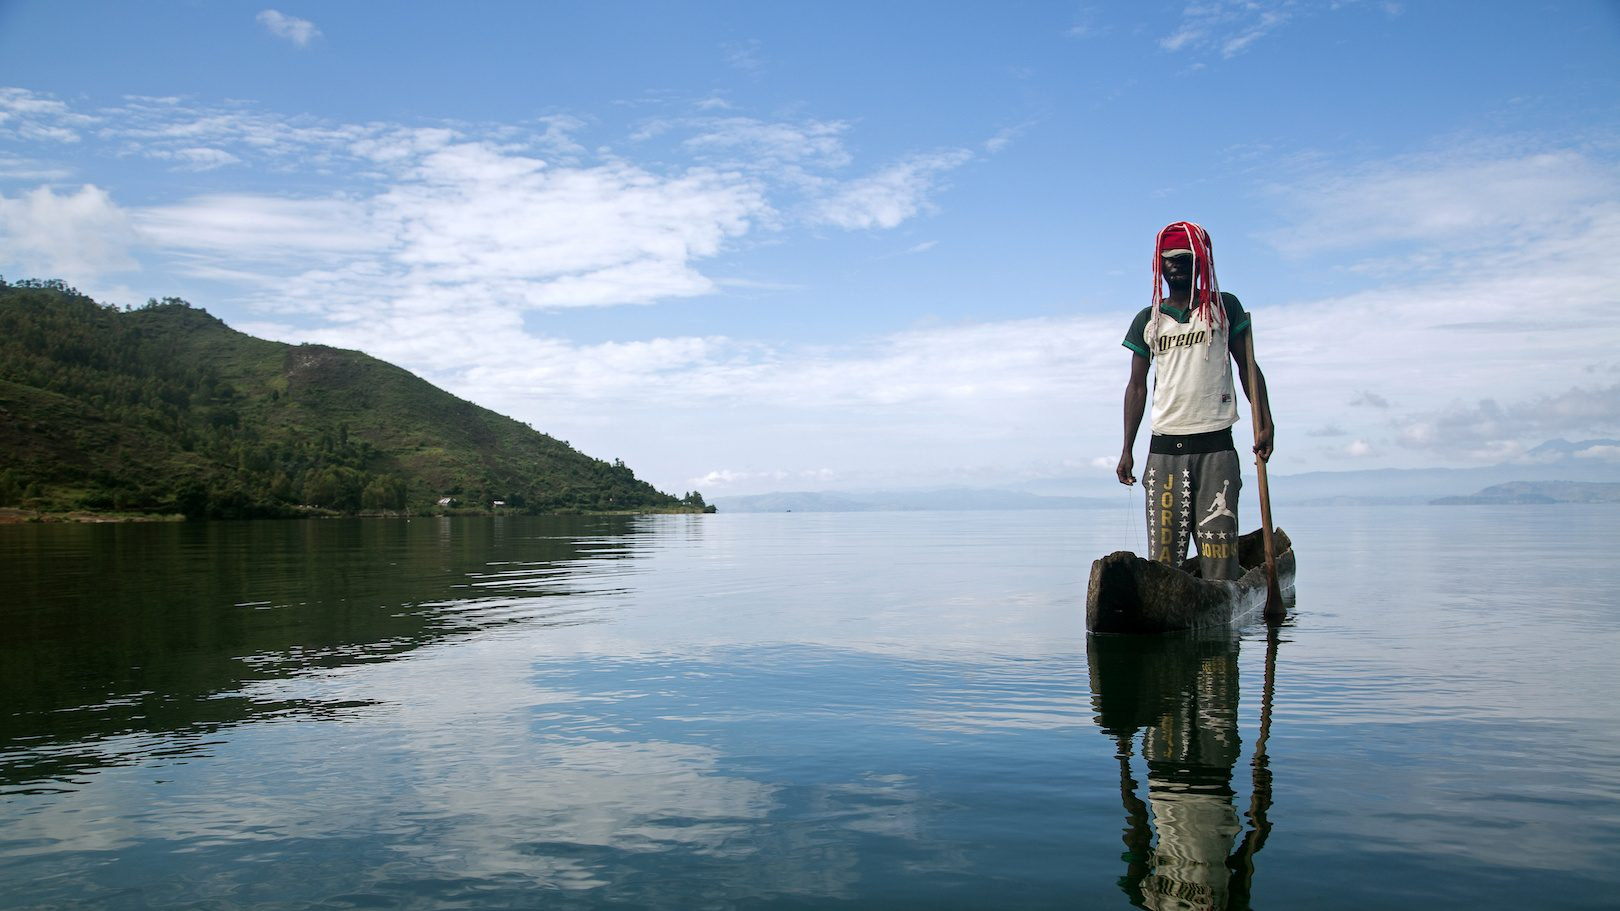 Manguiste, 24, stands in a canoe on Lake Kivu just off Idjwi island in the Democratic Republic of Congo,  November 26, 2016.